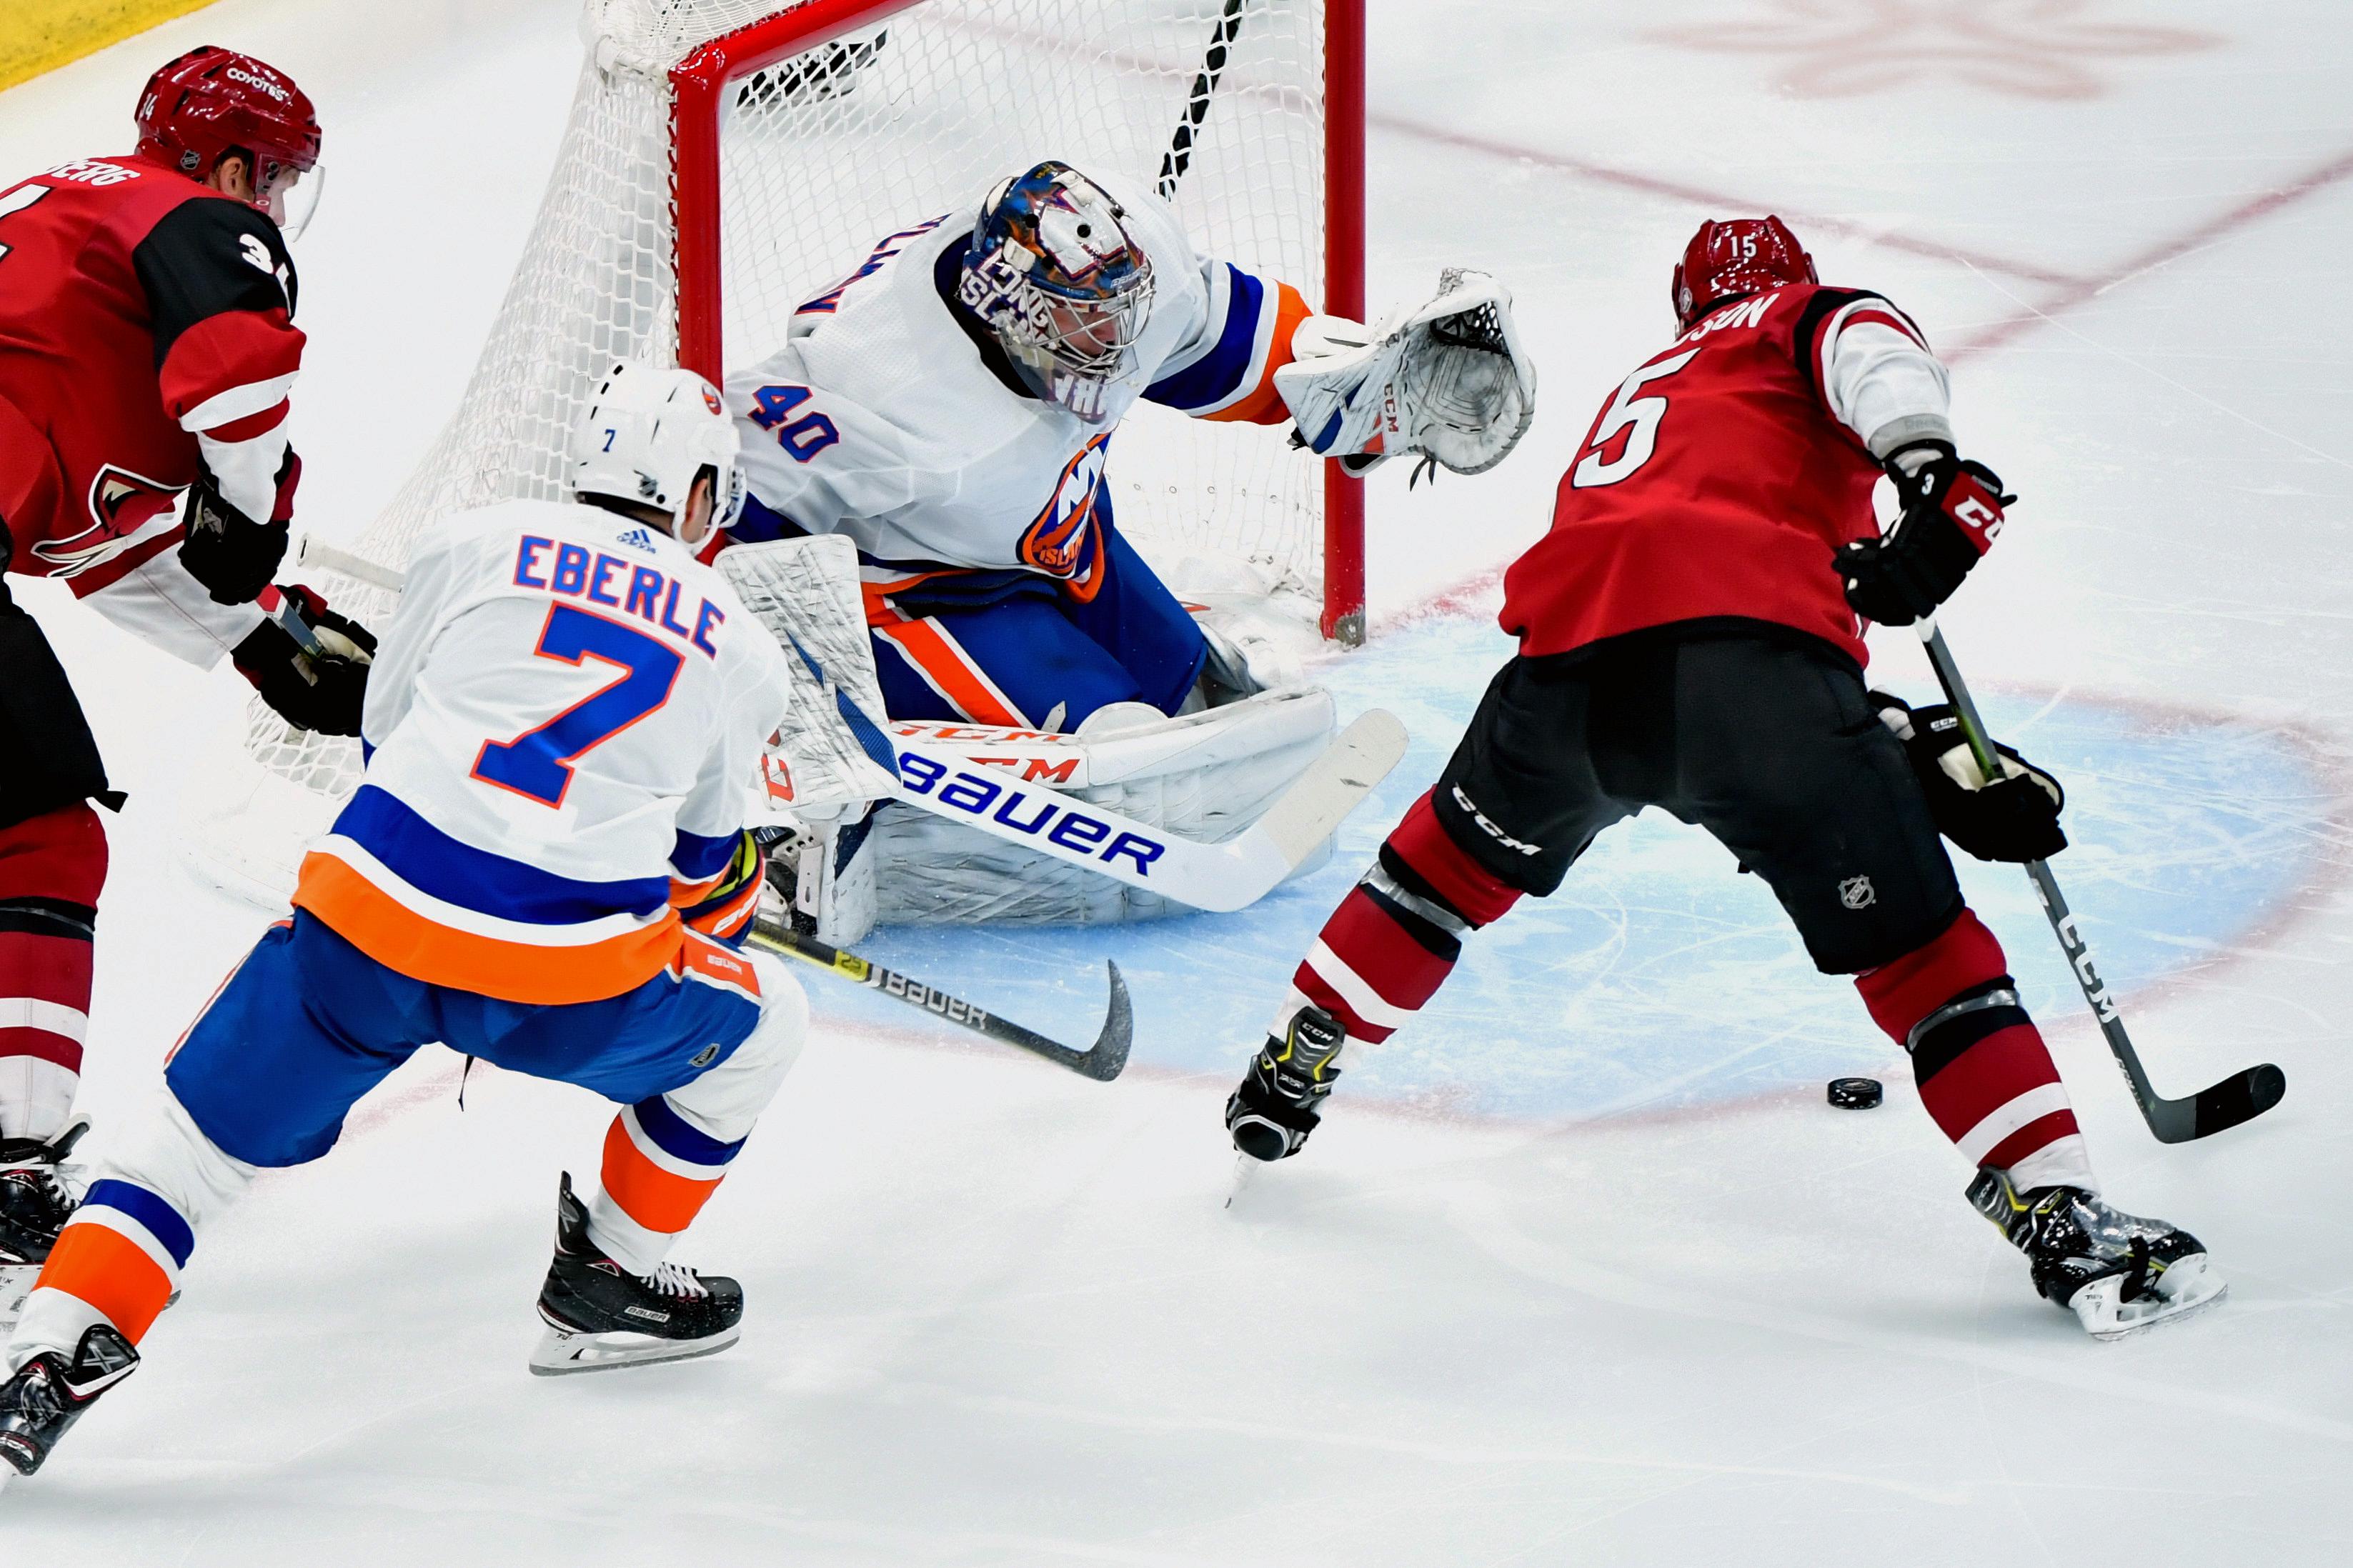 Feb 17, 2020; Glendale, Arizona, USA; Arizona Coyotes center Brad Richardson (15) shoots against New York Islanders goaltender Semyon Varlamov (40) during the second period at Gila River Arena. Mandatory Credit: Matt Kartozian-USA TODAY Sports